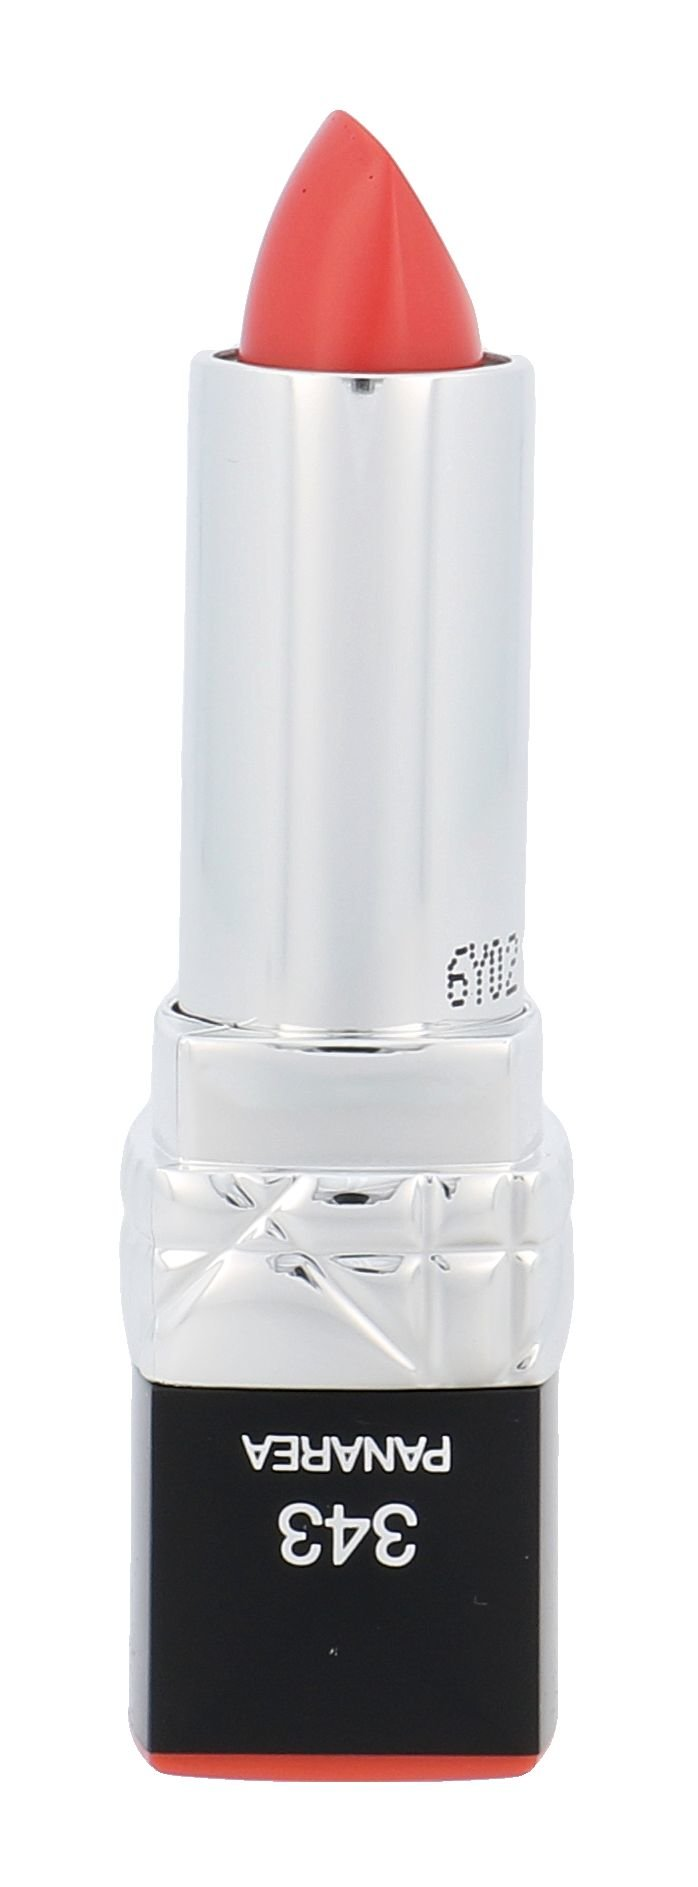 Christian Dior Rouge Dior Cosmetic 3,5ml 343 Panarea